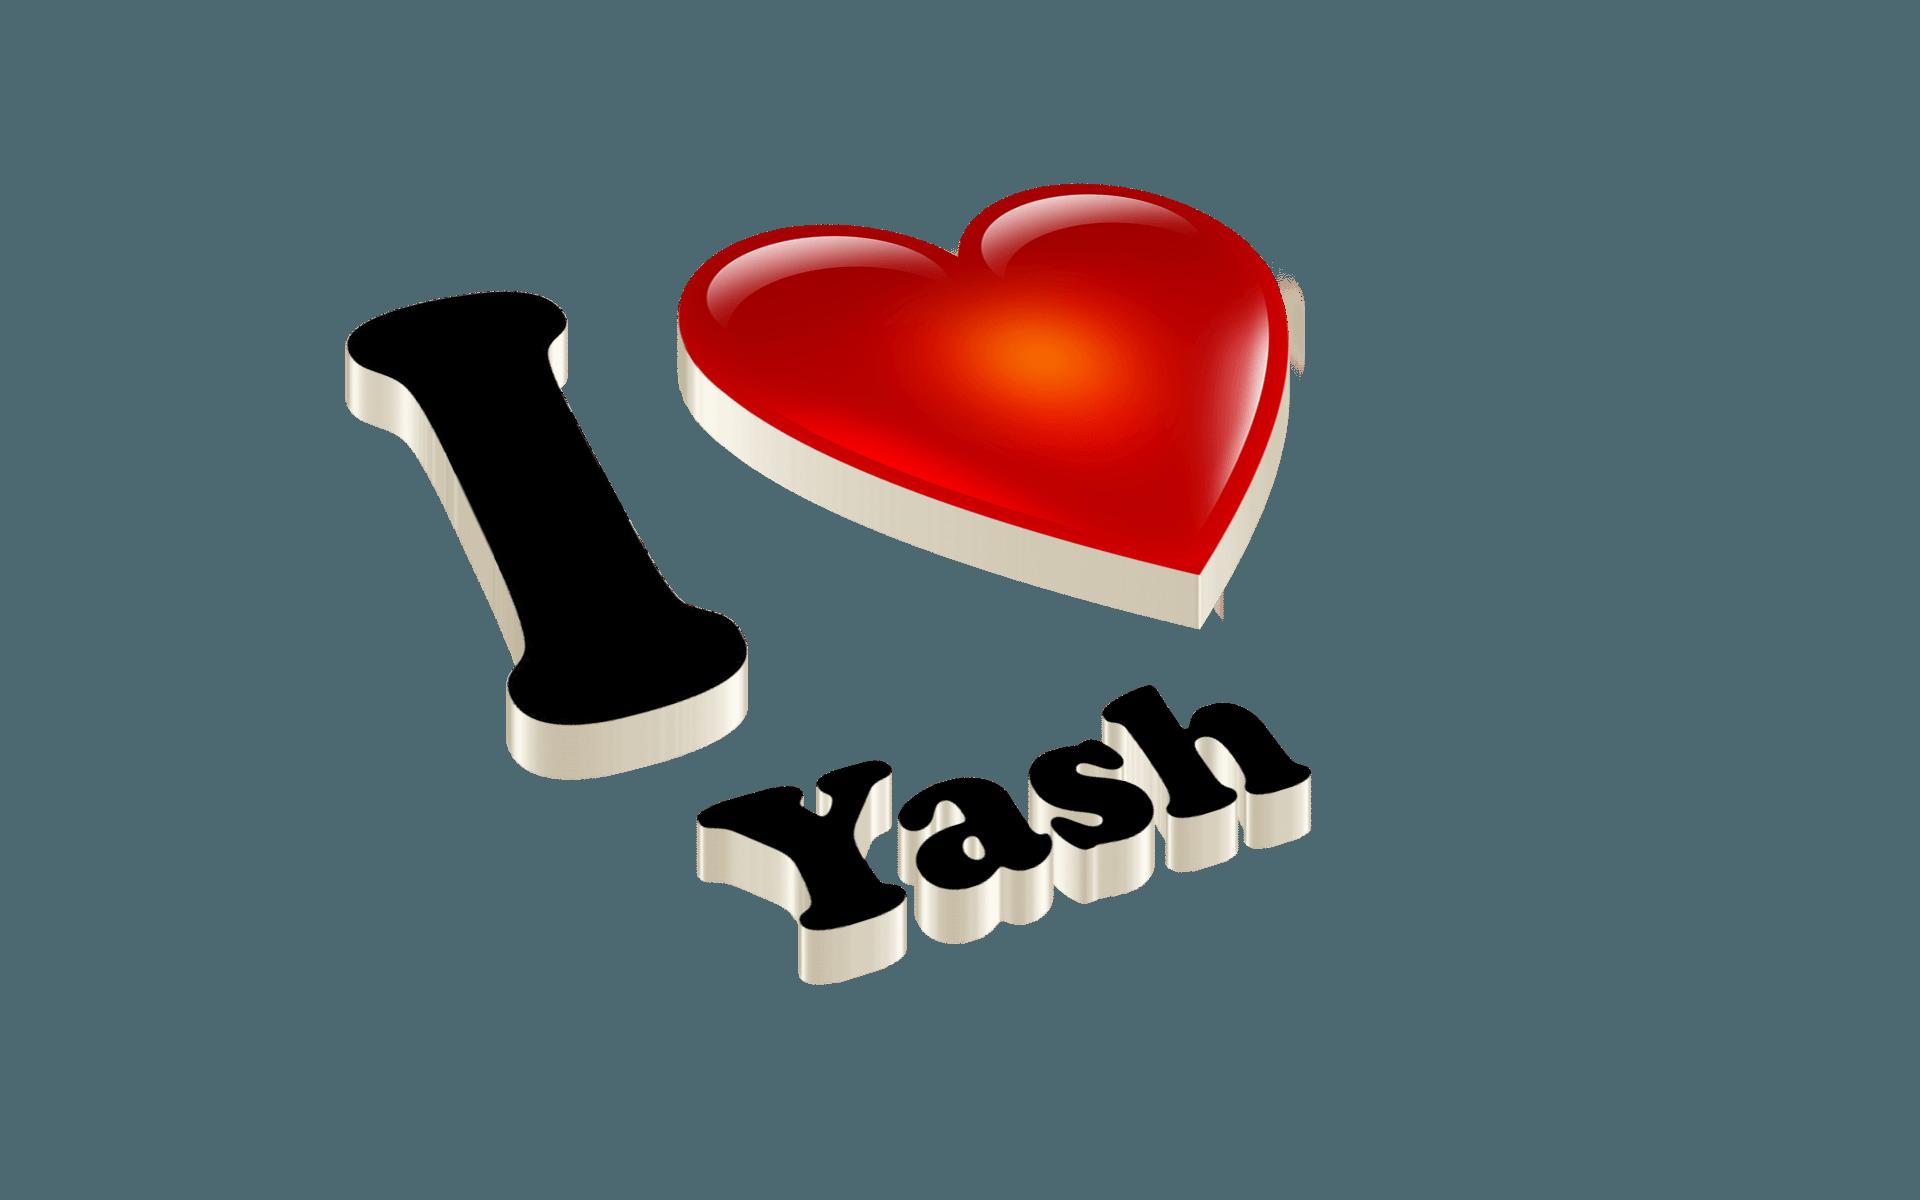 Popular Wallpaper Name Yash - wp2496739  You Should Have_28180.png